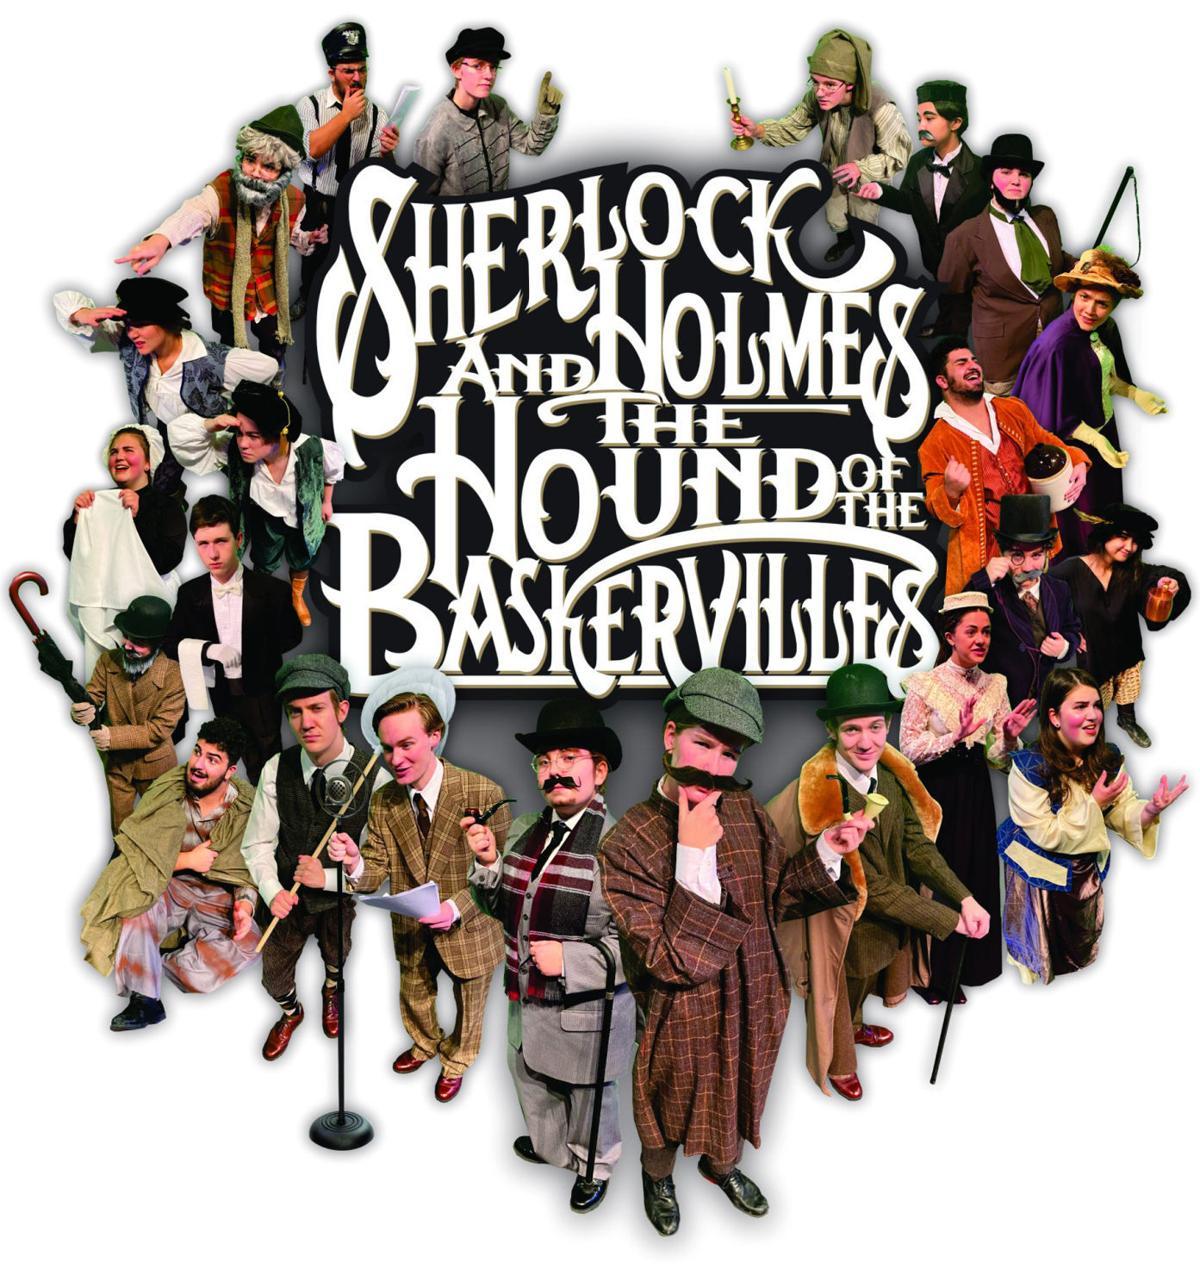 Sherlock Holmes CHS Musical